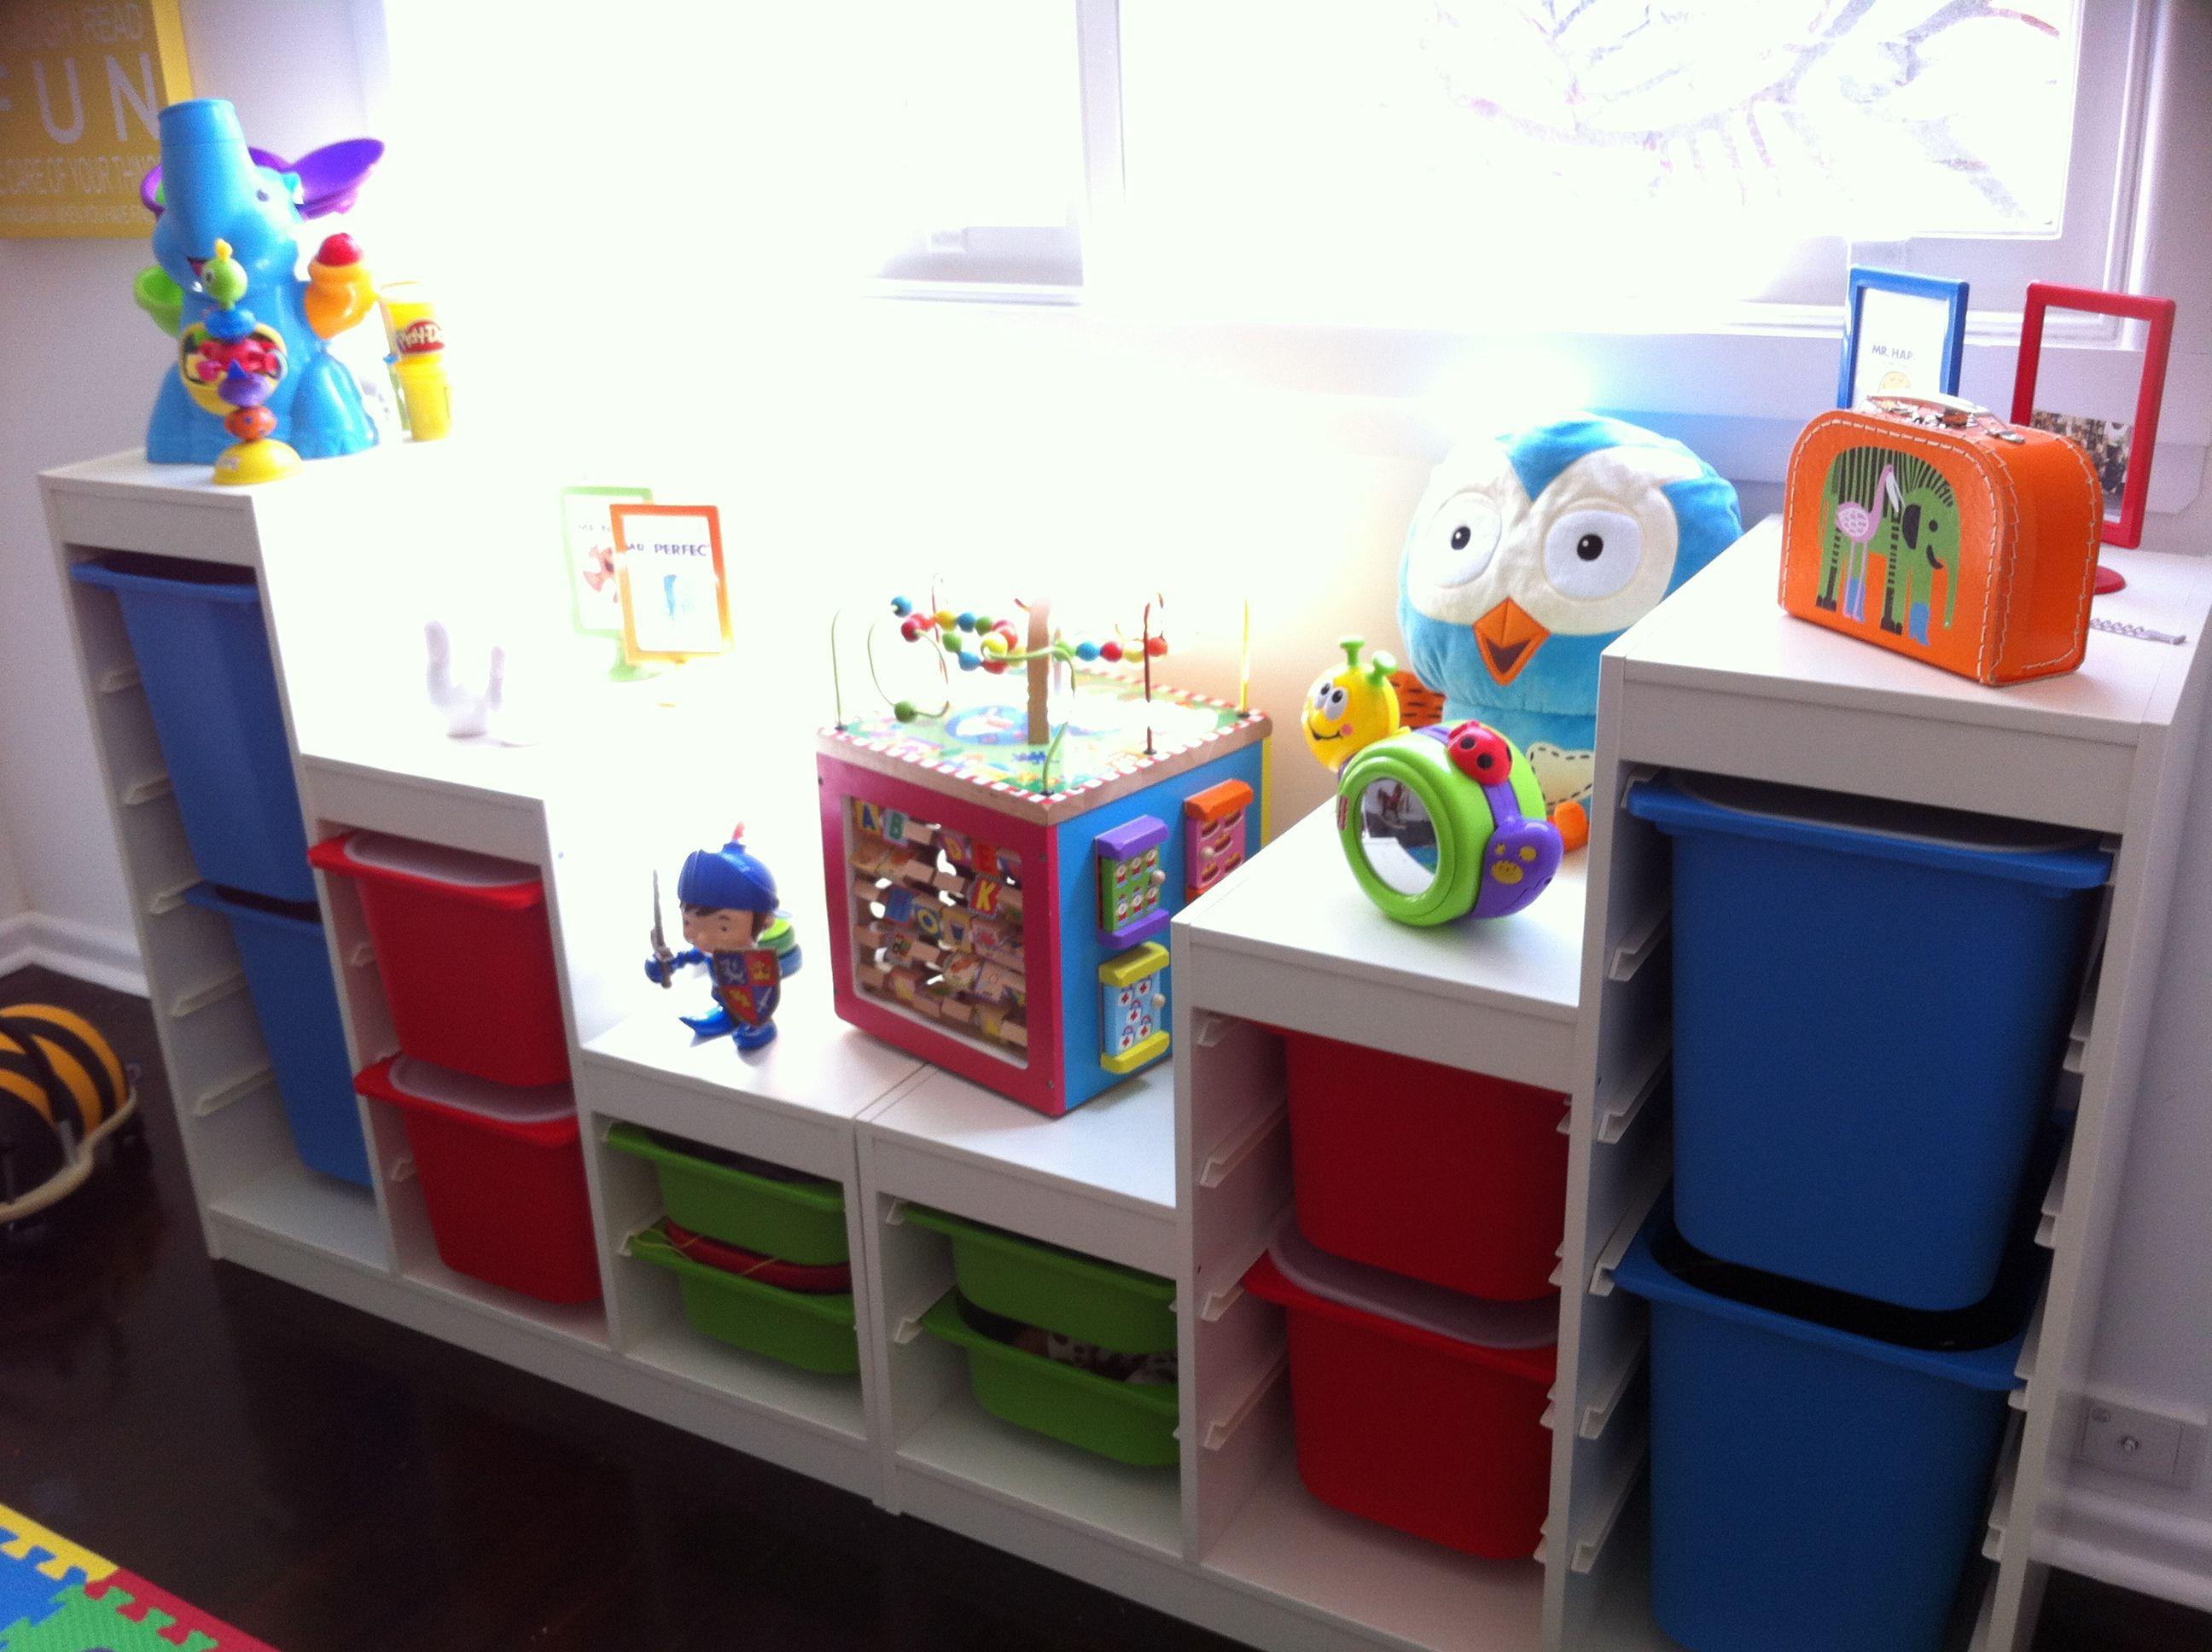 Unique 17 Ikea Playroom Ideas 2592x1936 Storage Solutions For Room Designs  Design Ideas